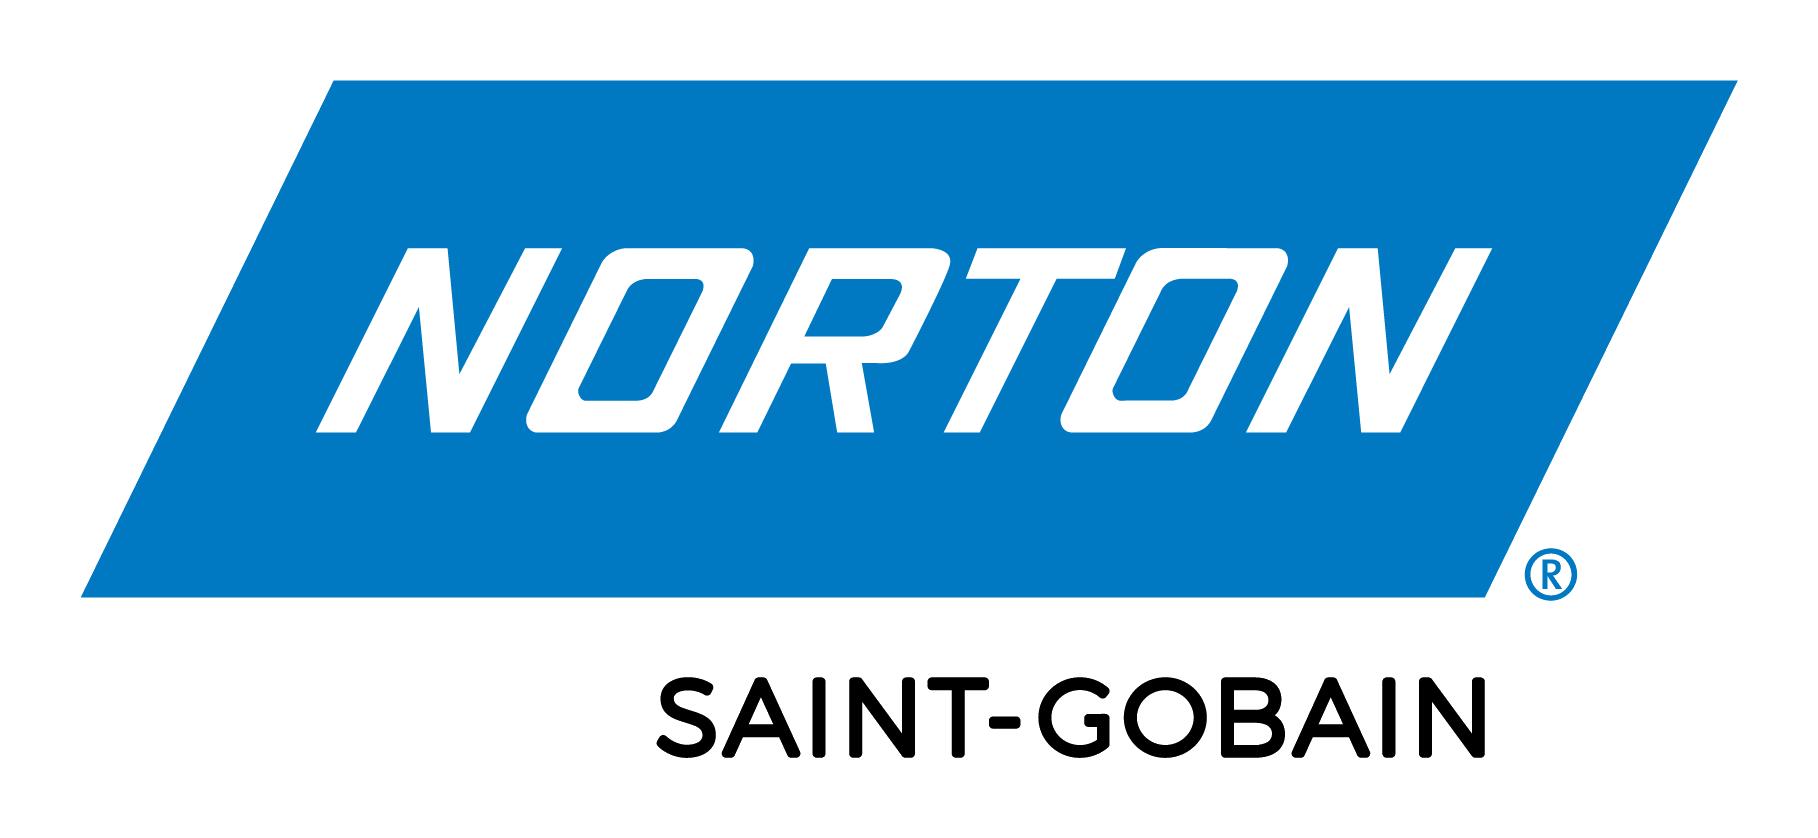 SG_Norton_logo_rgb_12